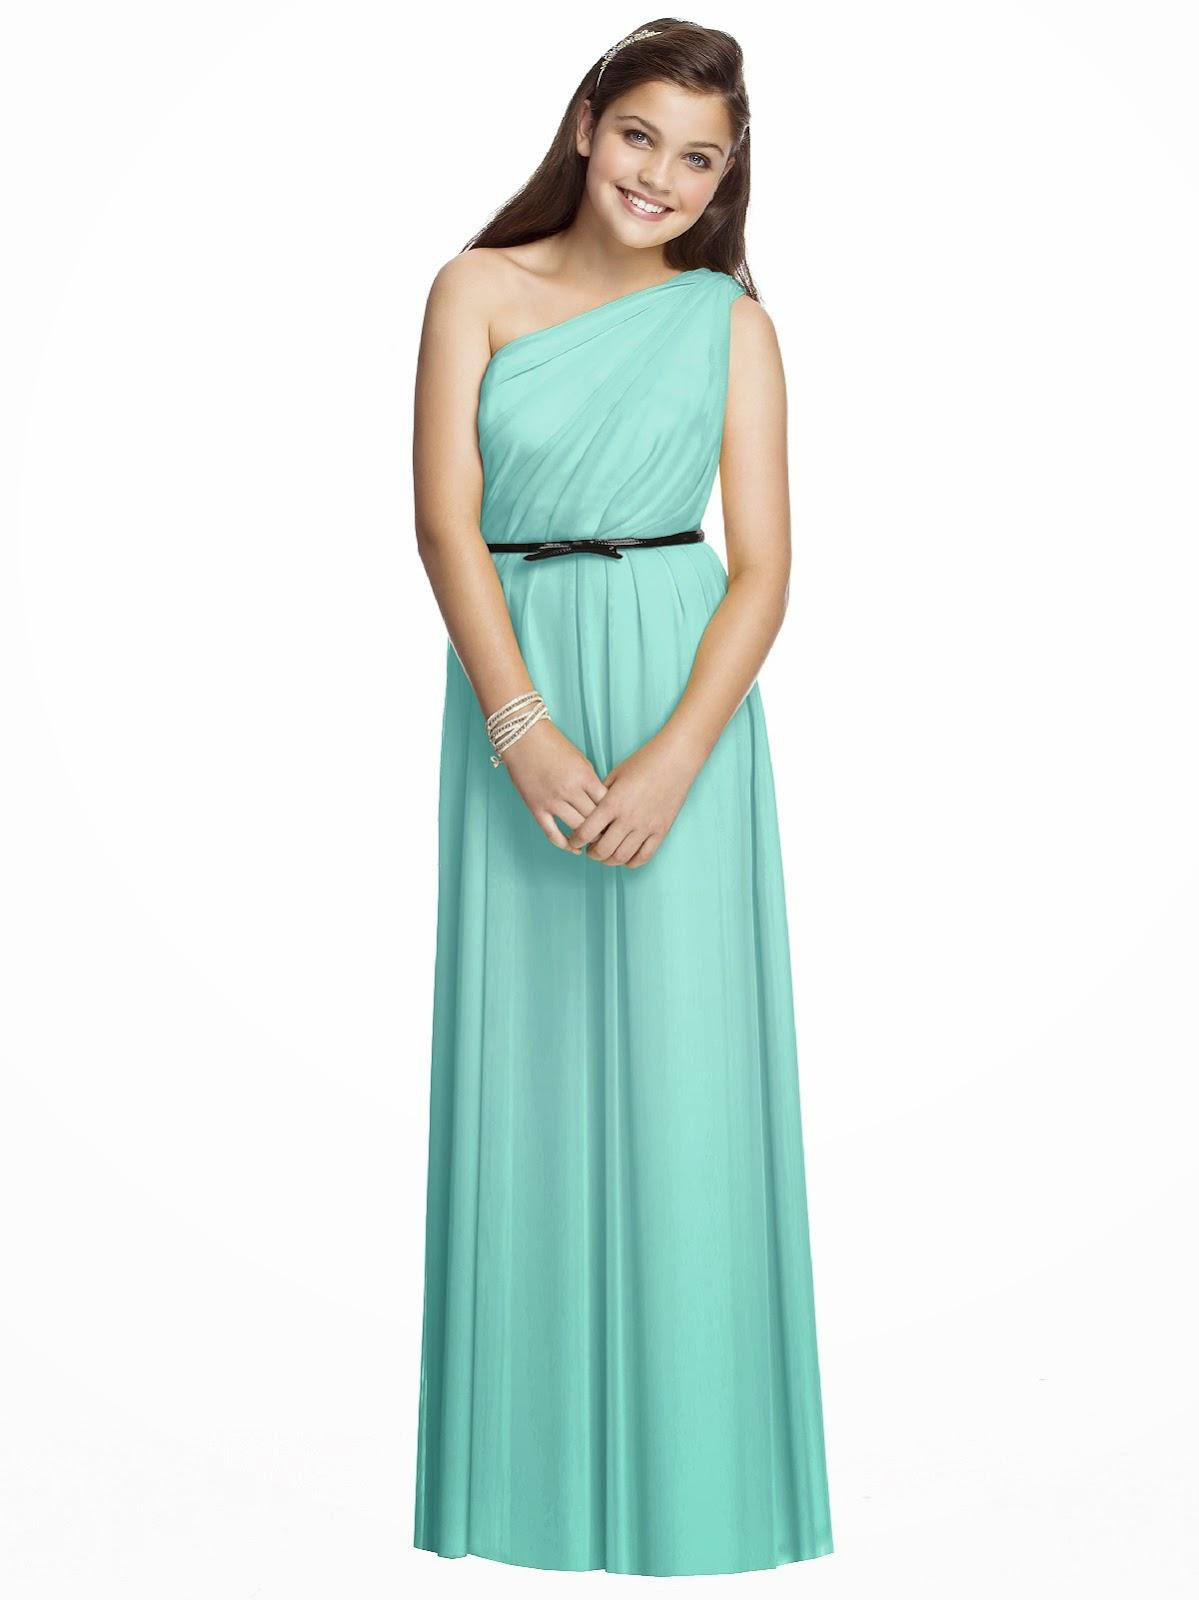 Diamond Ring: Macys Wedding Dresses For Juniors